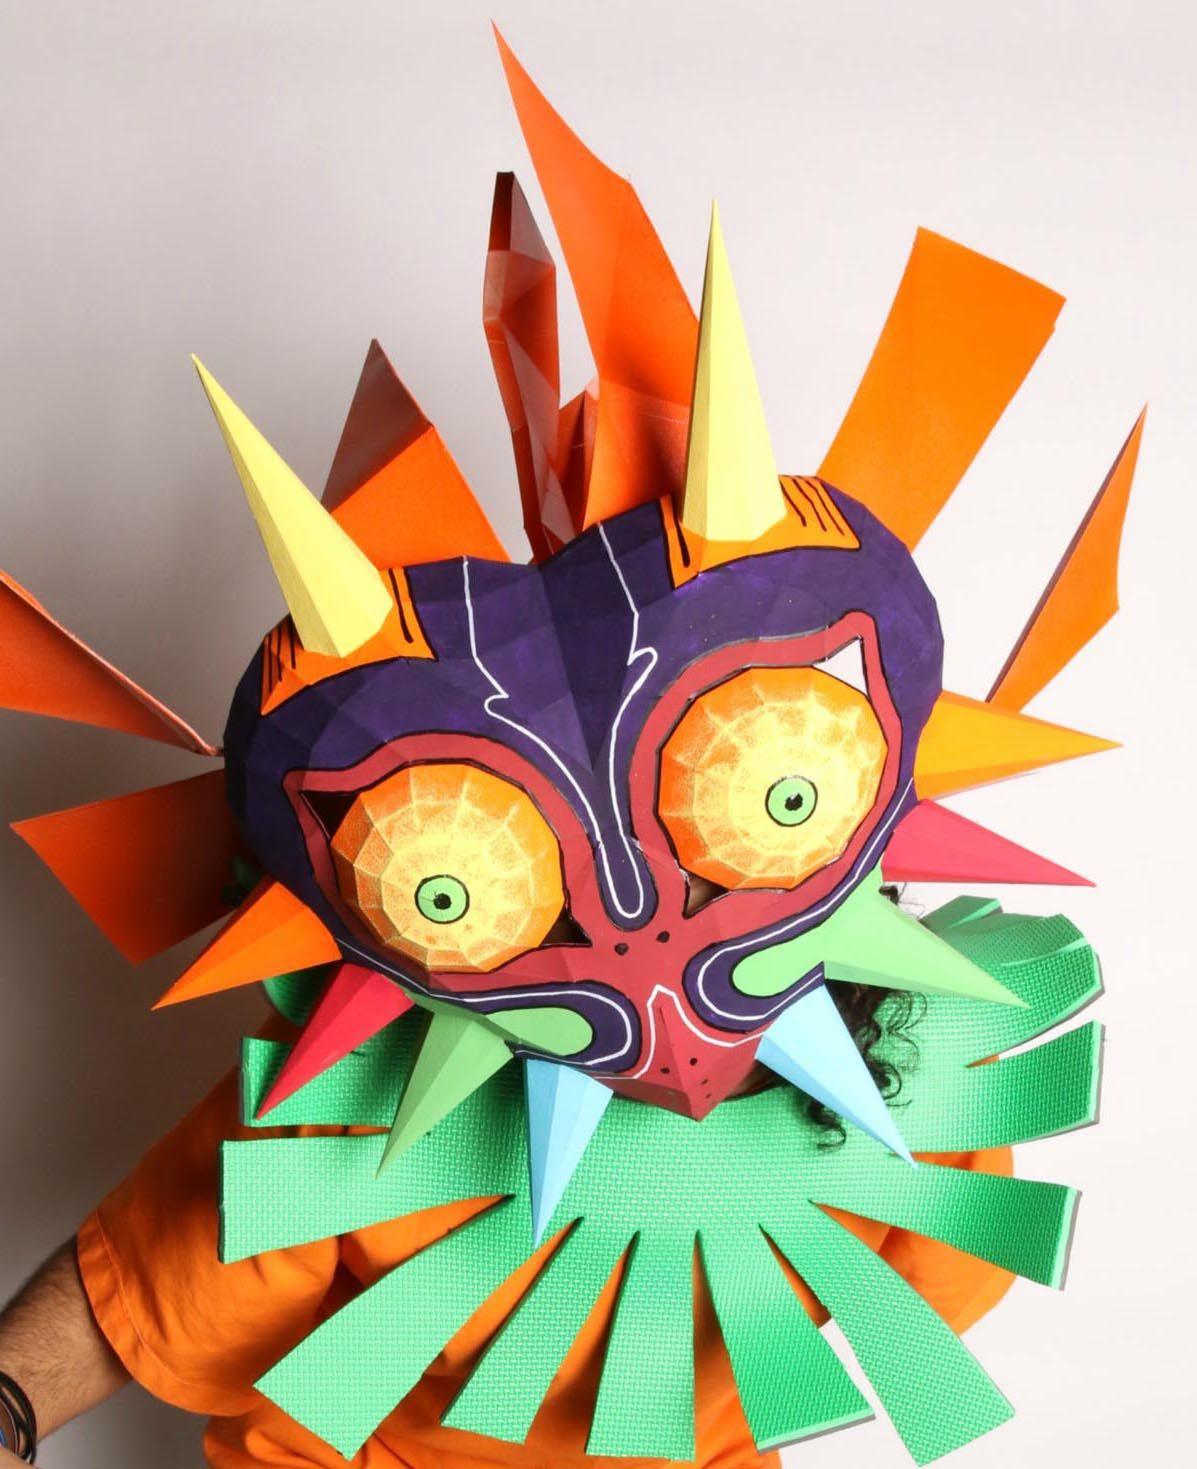 Majora's Mask Papercraft #majorasmask #zelda #legendofzelda ...